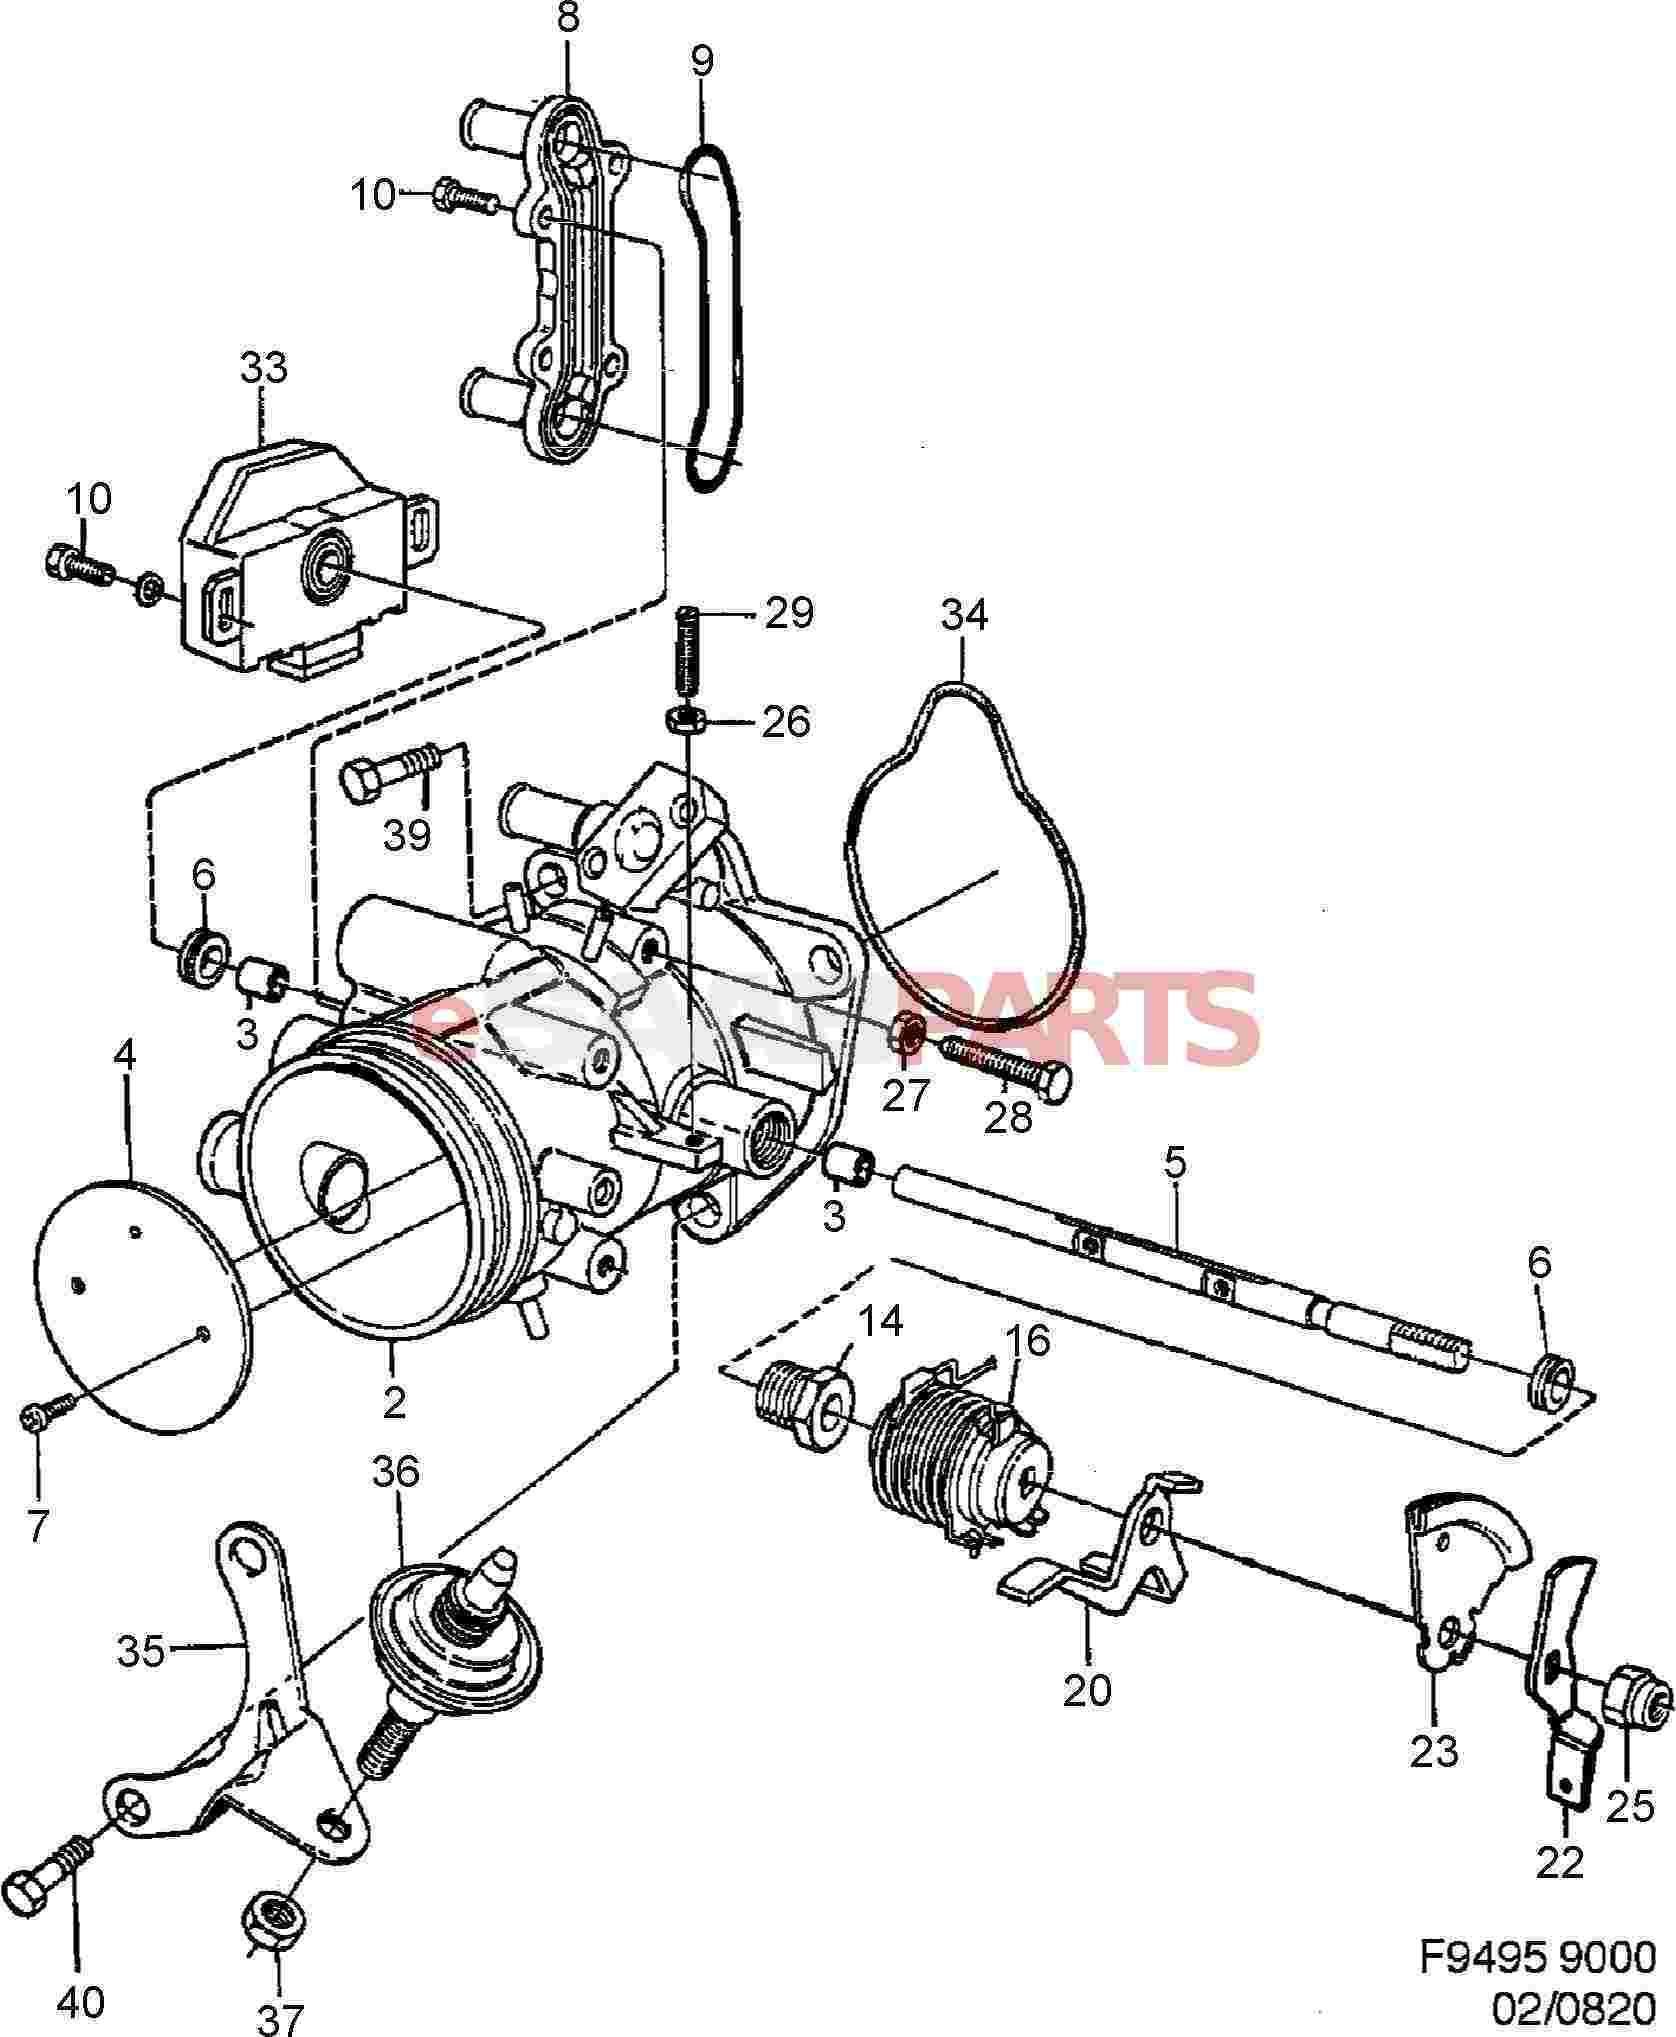 Saab 9000 Engine Diagram Quick Start Guide Of Wiring Pontiac Sunbird Esaabparts Com U003e Parts Traction Control Rh